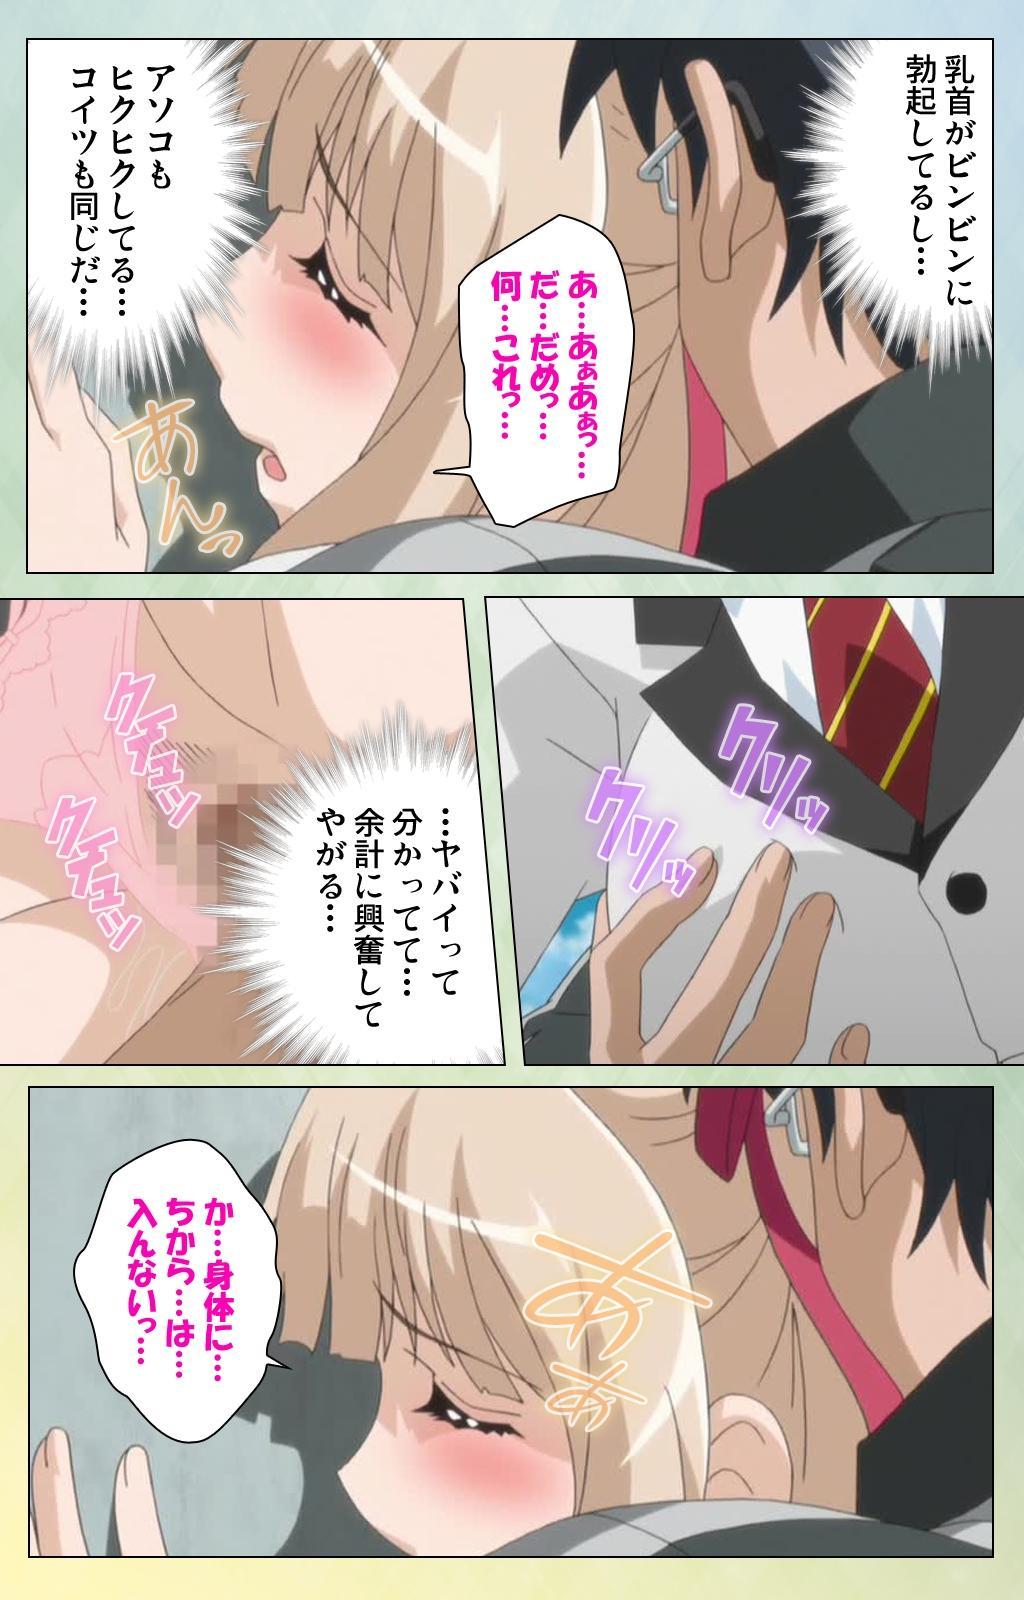 Furueru Kuchibiru fuzzy lips0 Complete Ban 40